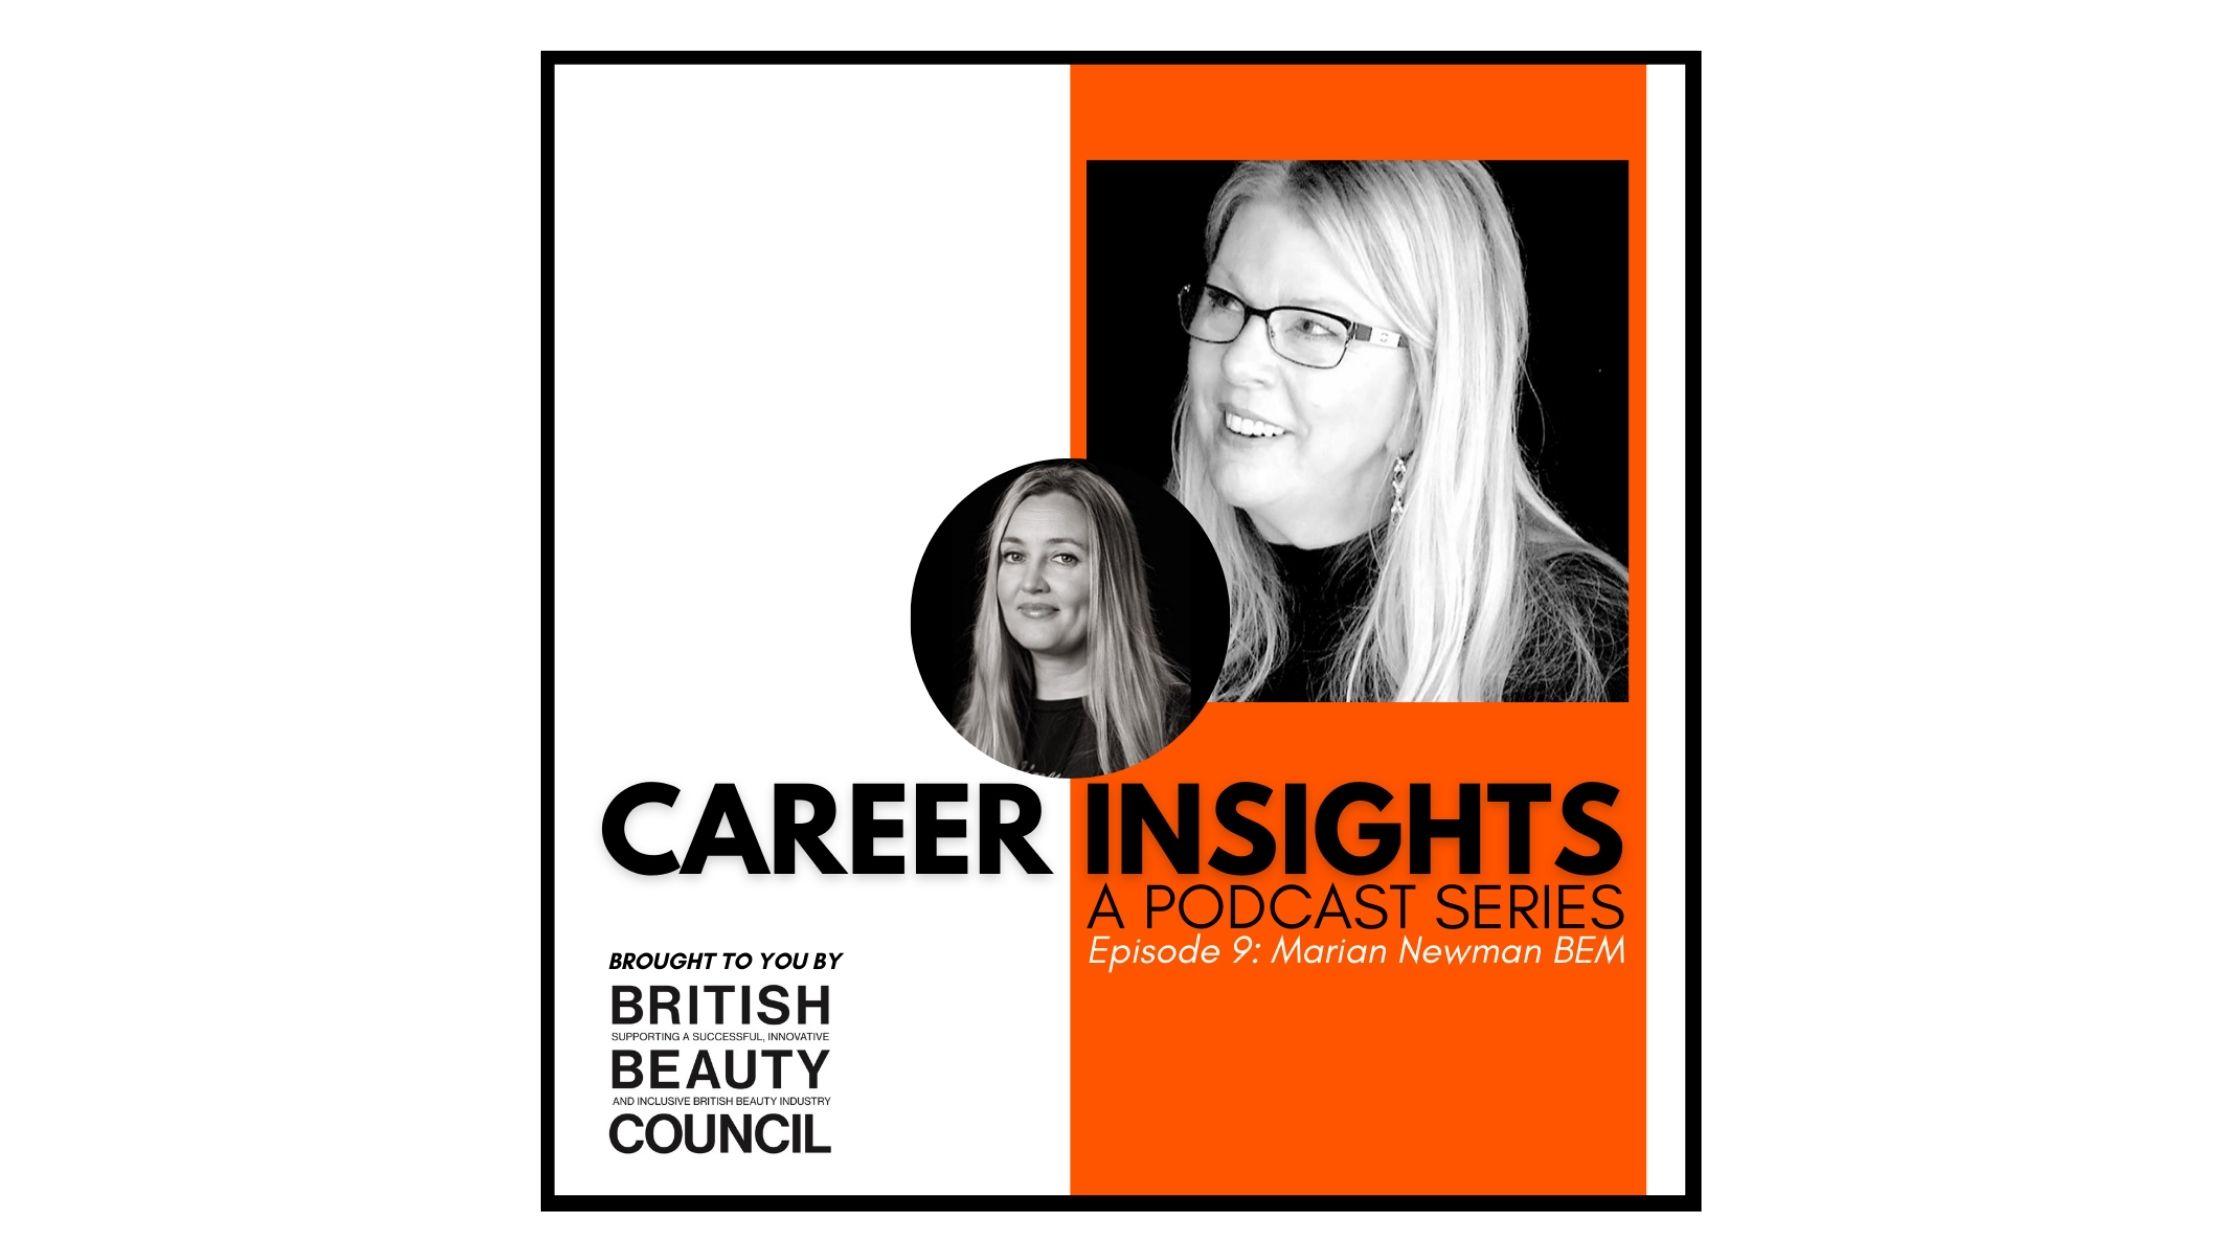 Career Insights: Marian Newman BEM speaks with Elizabeth Barnett Lawton